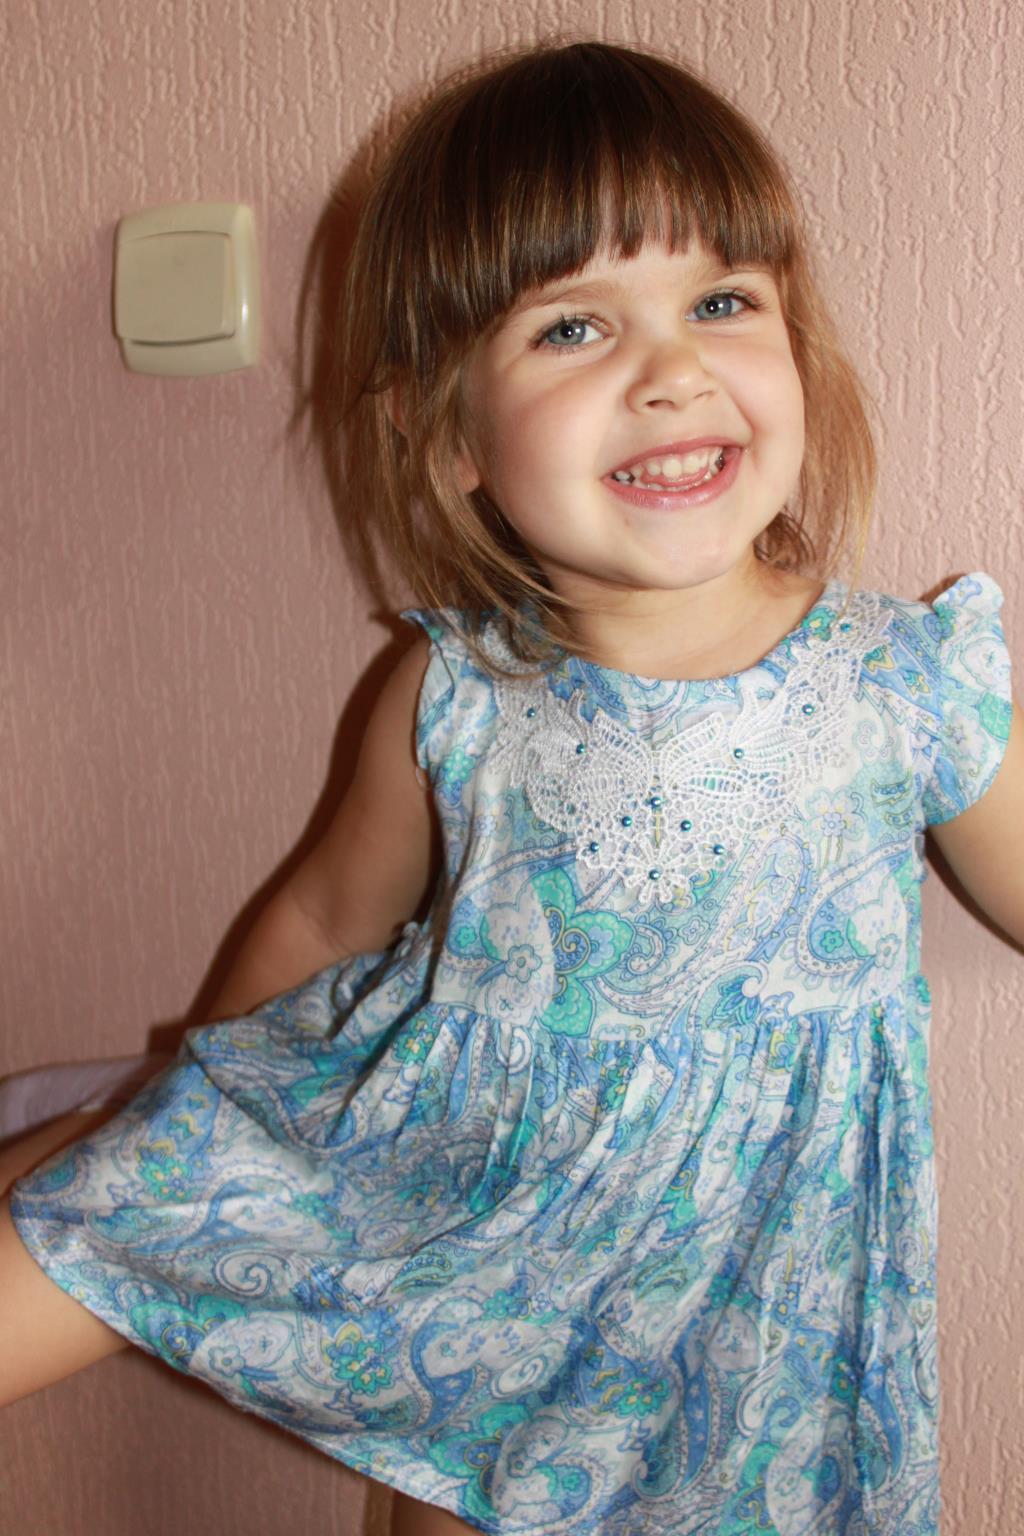 Девочка -улыбка. С улыбкой по жизни